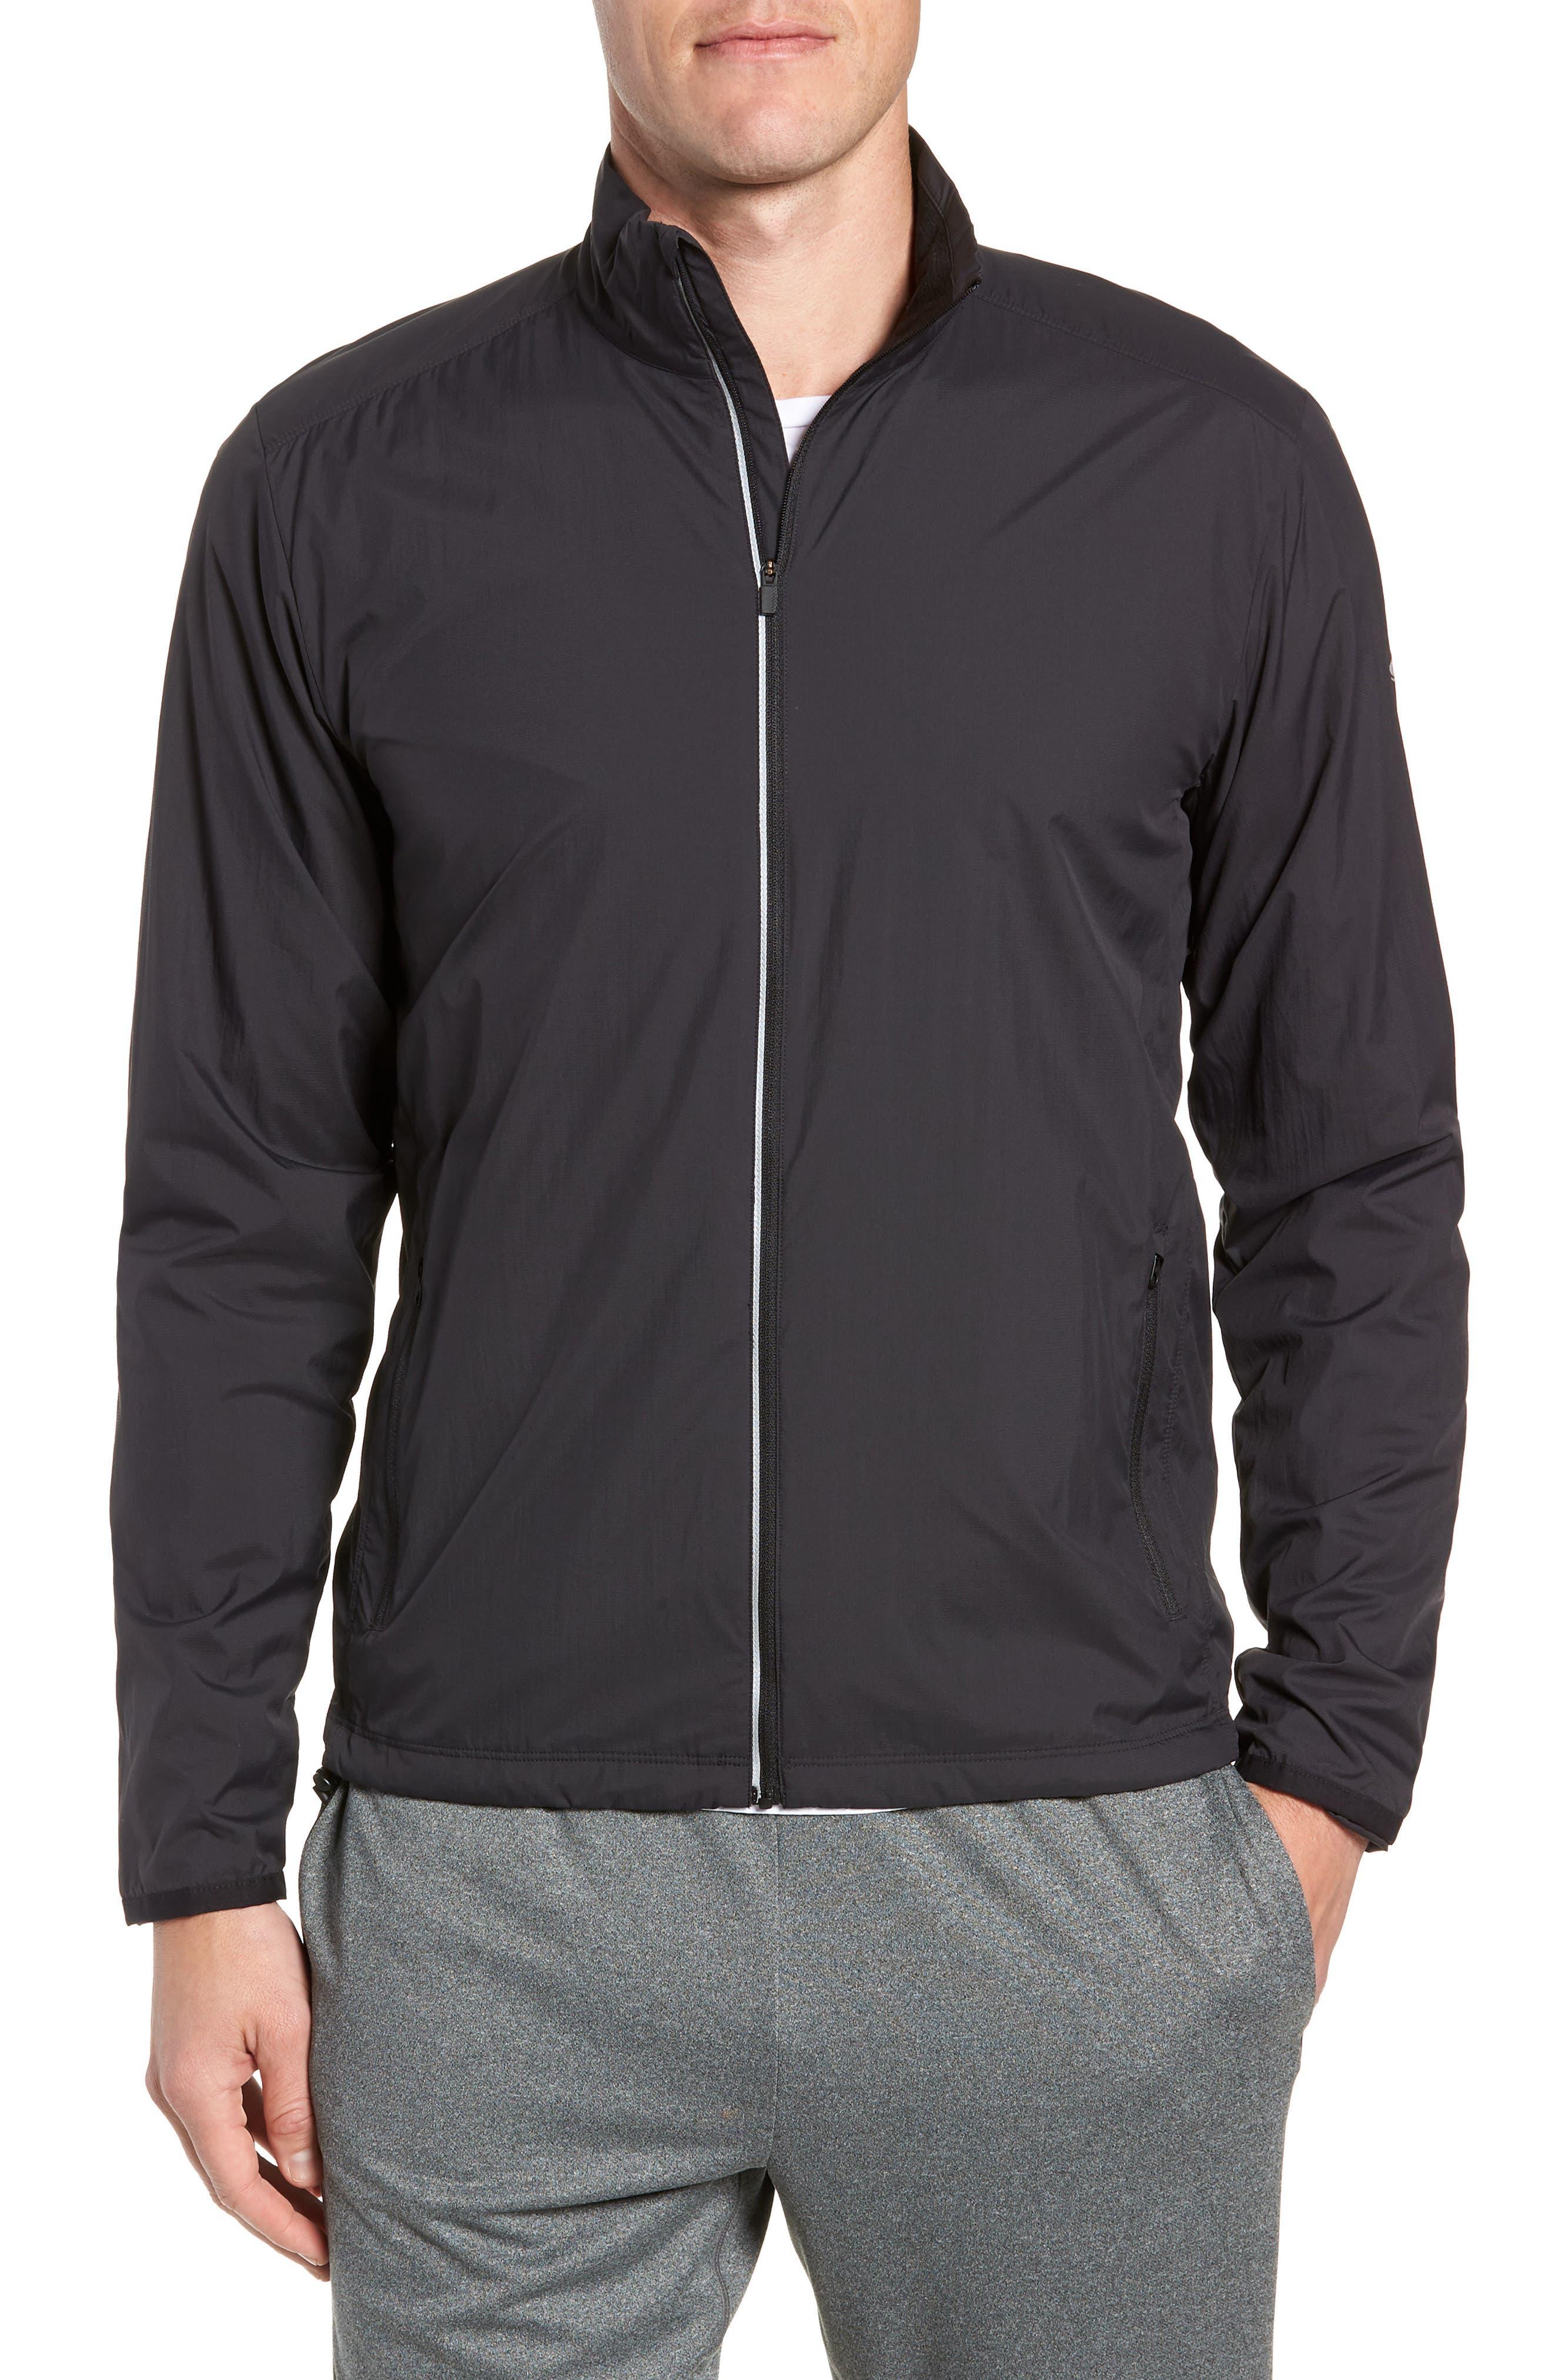 Cool-Lite<sup>™</sup> Incline Windbreaker Jacket,                         Main,                         color, BLACK